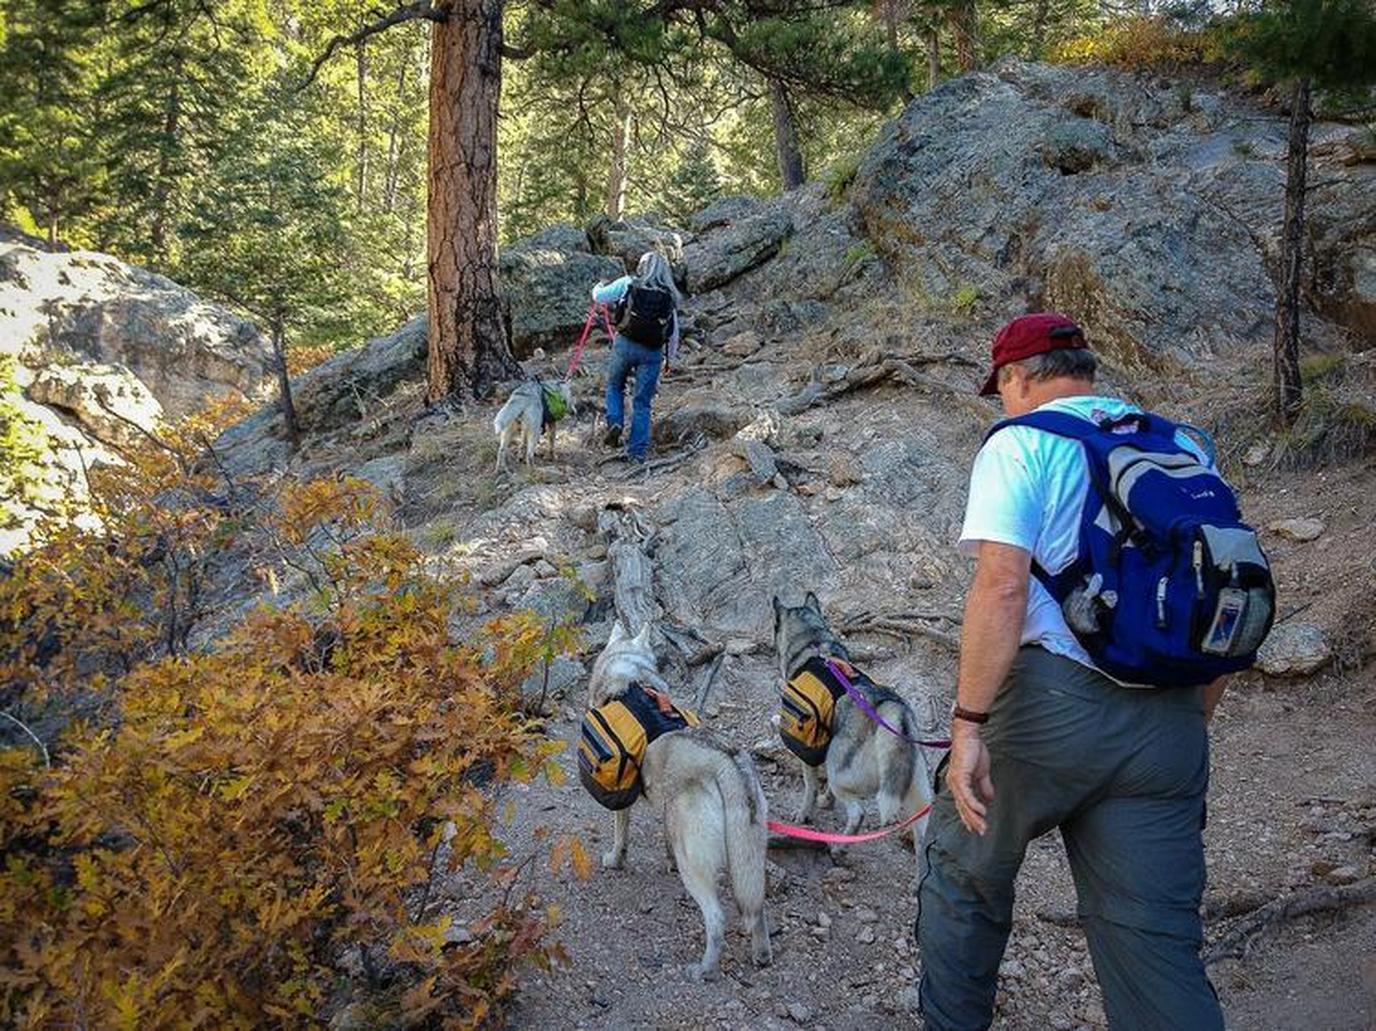 Bring Fido to dog-friendly Santa Fe for a weekend destination you'll both love.